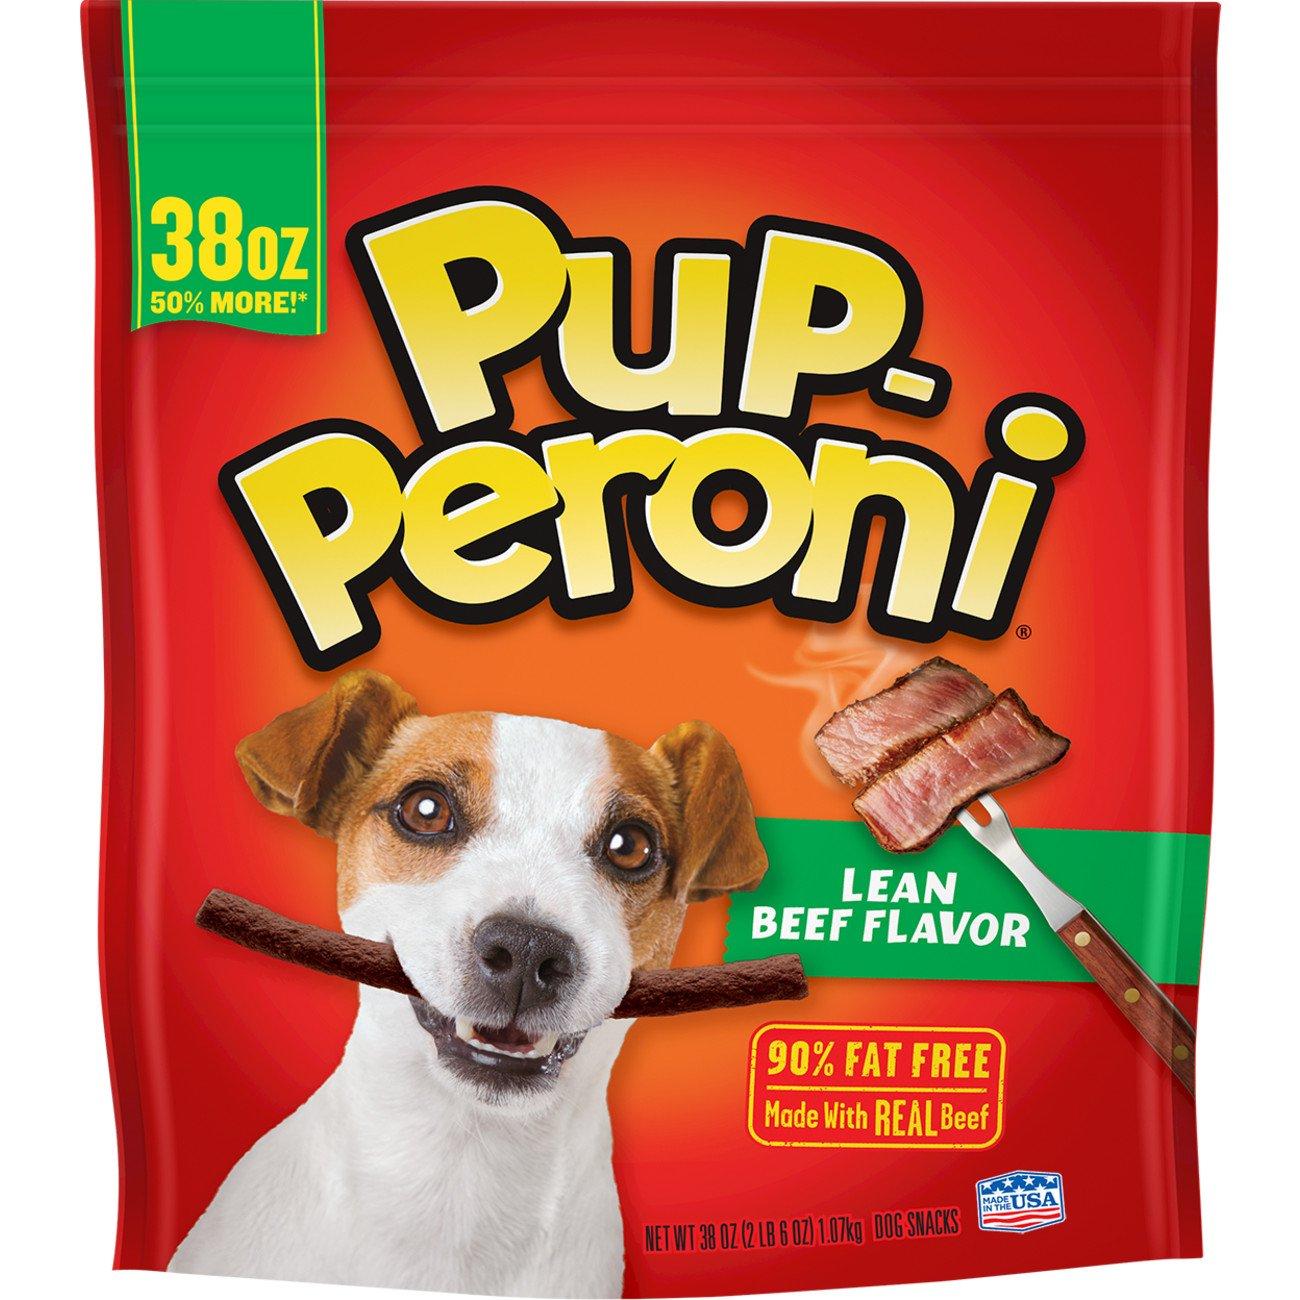 Pup-Peroni Lean Beef Flavor Dog Snacks, 38 oz